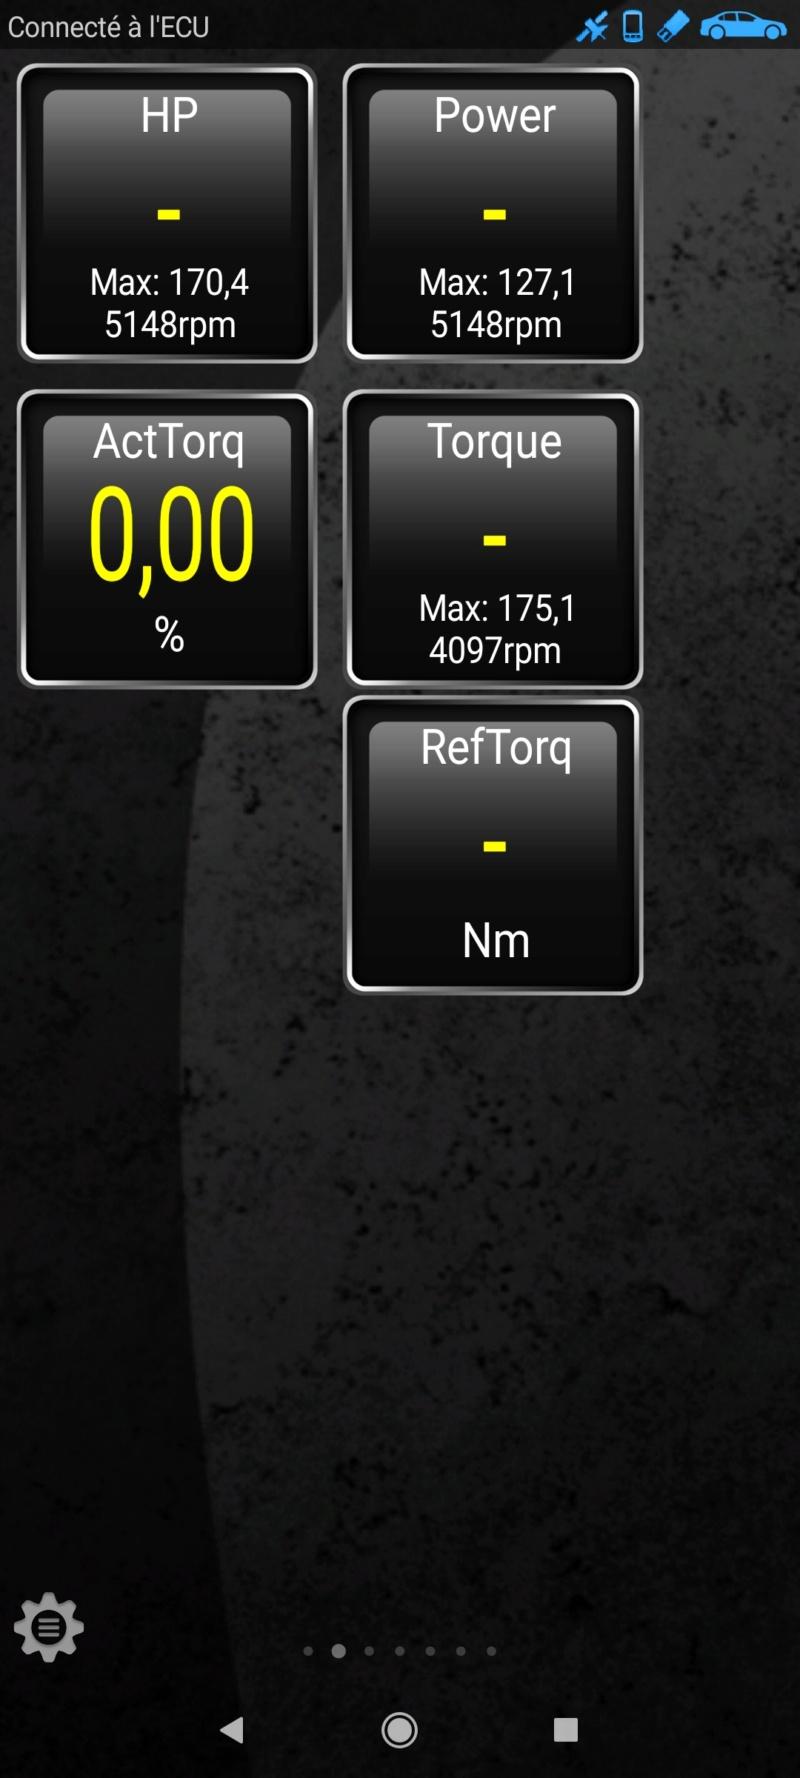 [F4RT85] Laguna III.1 GT 4C 2L TURBO 205 (Barres de toit) - Page 5 Screen20